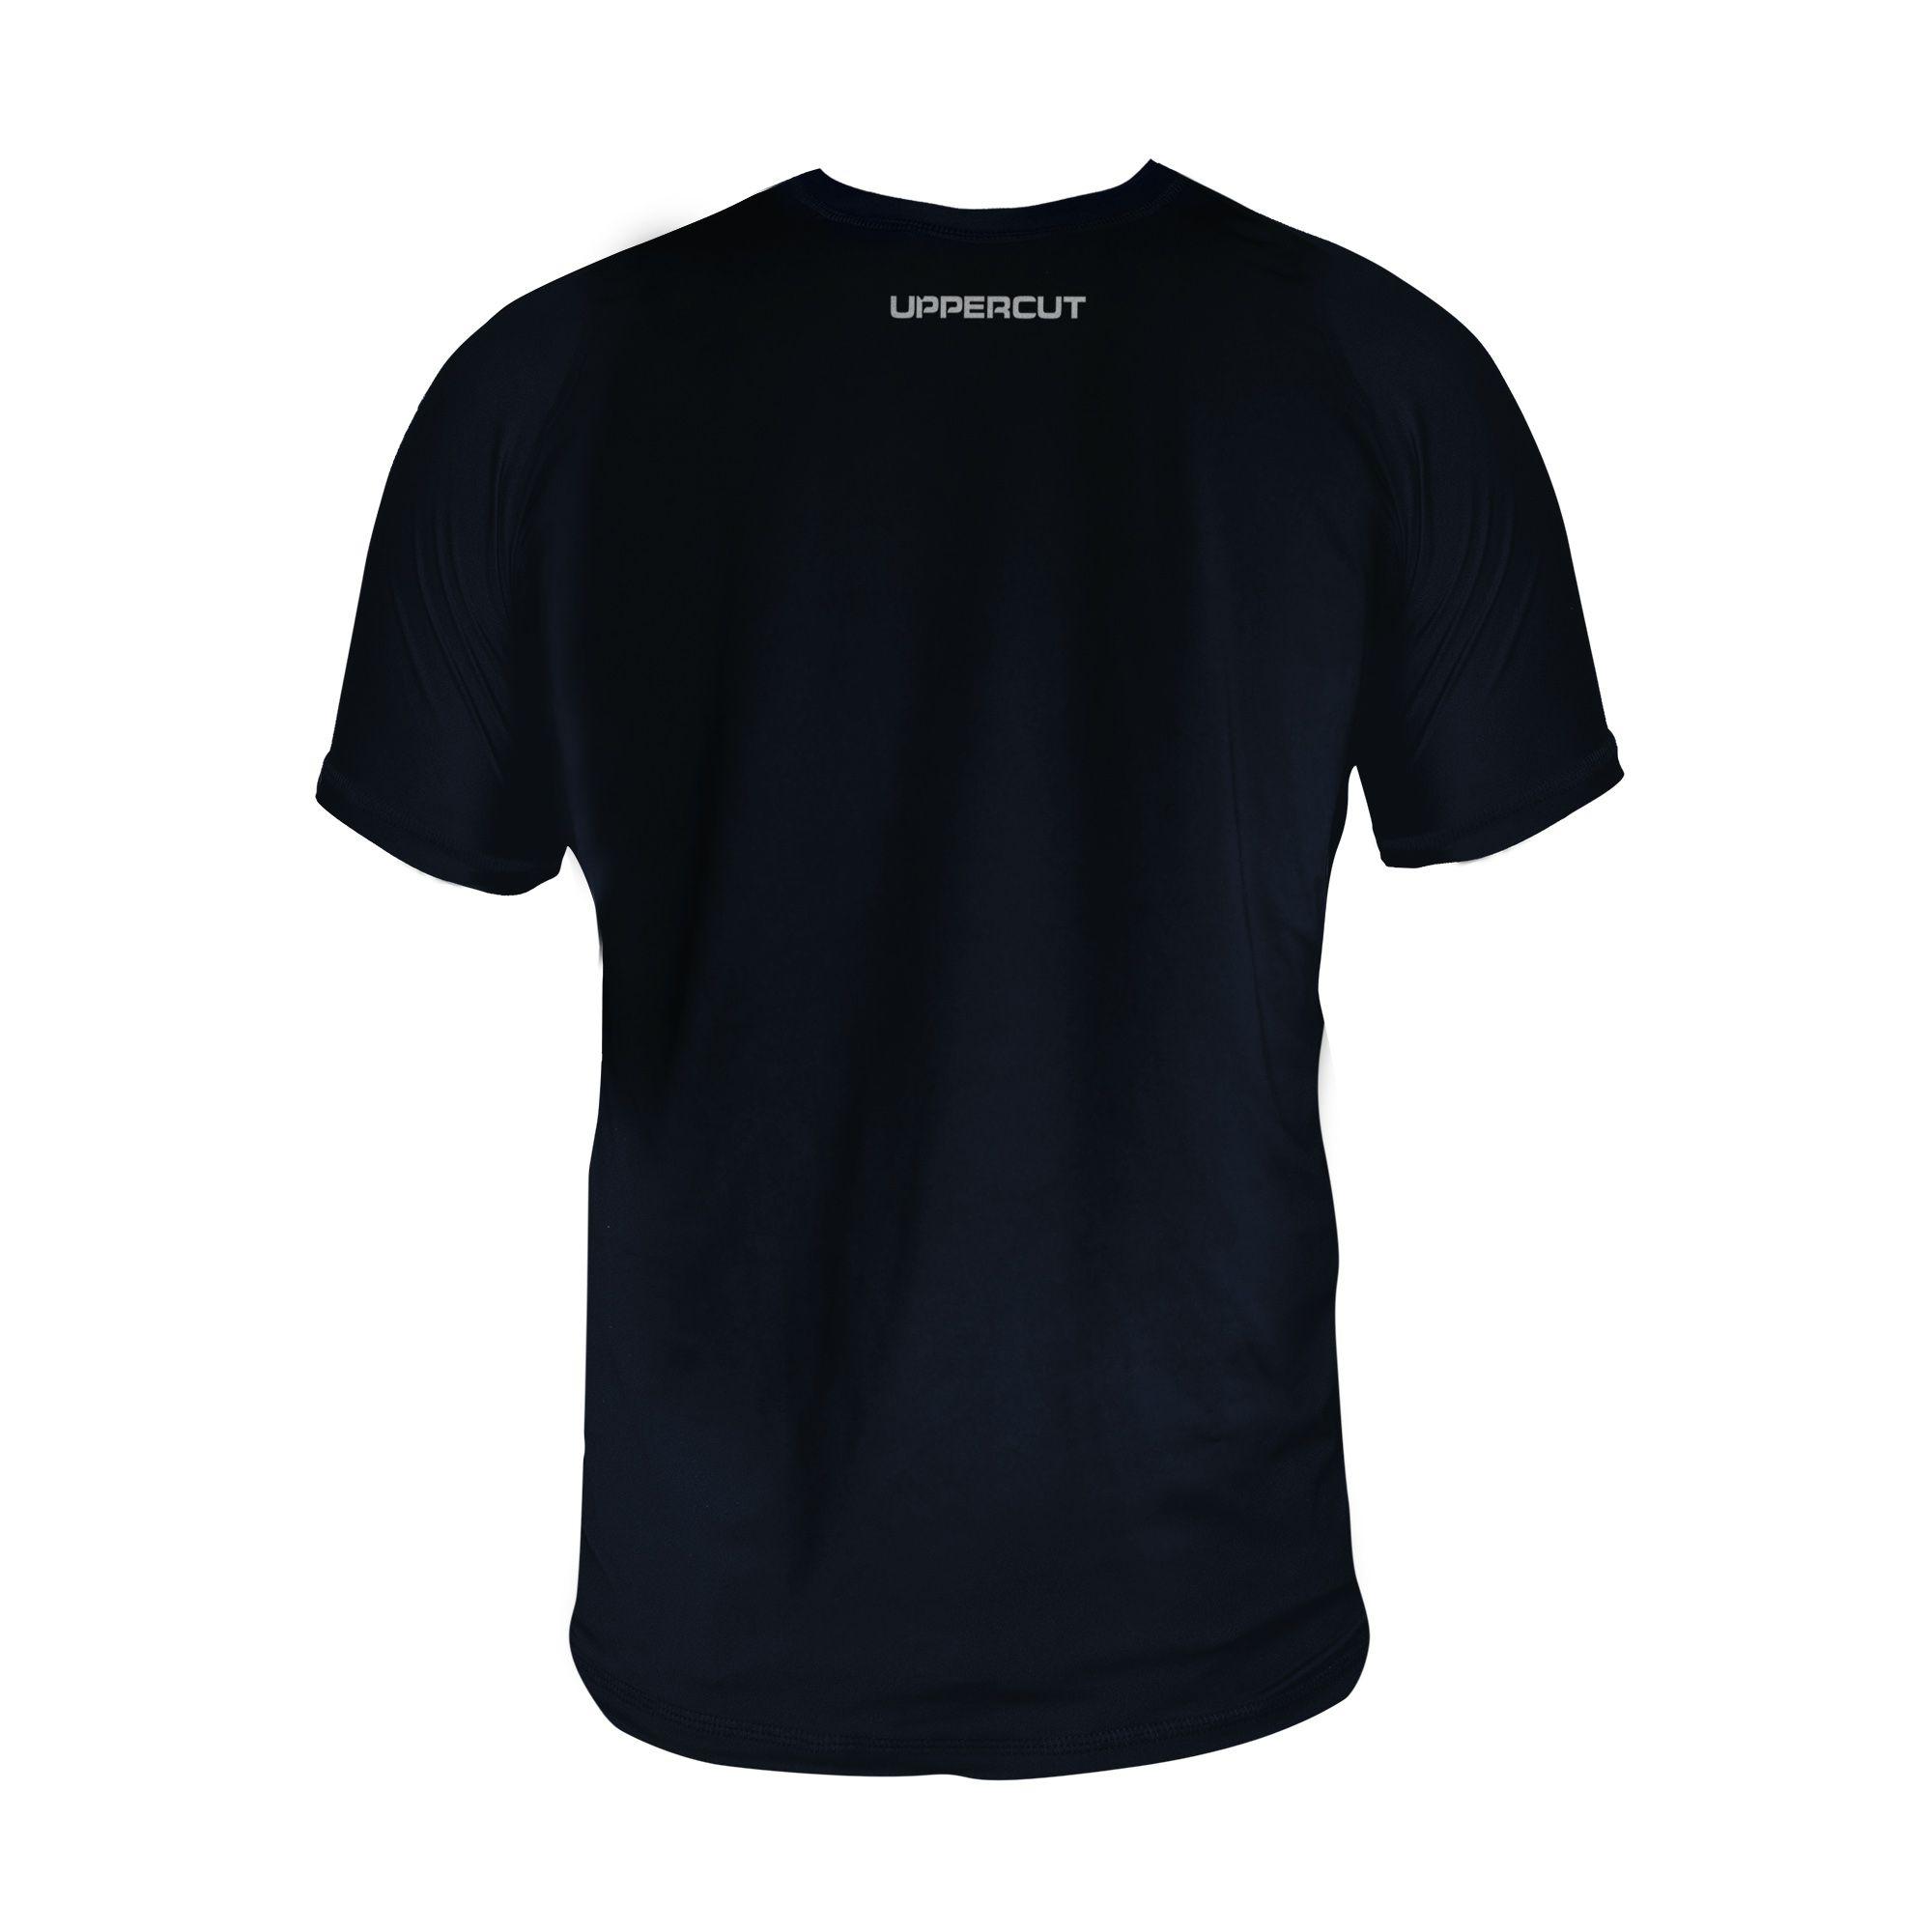 Camiseta  Kickboxing Muay Thai Uppercut Dry U.V